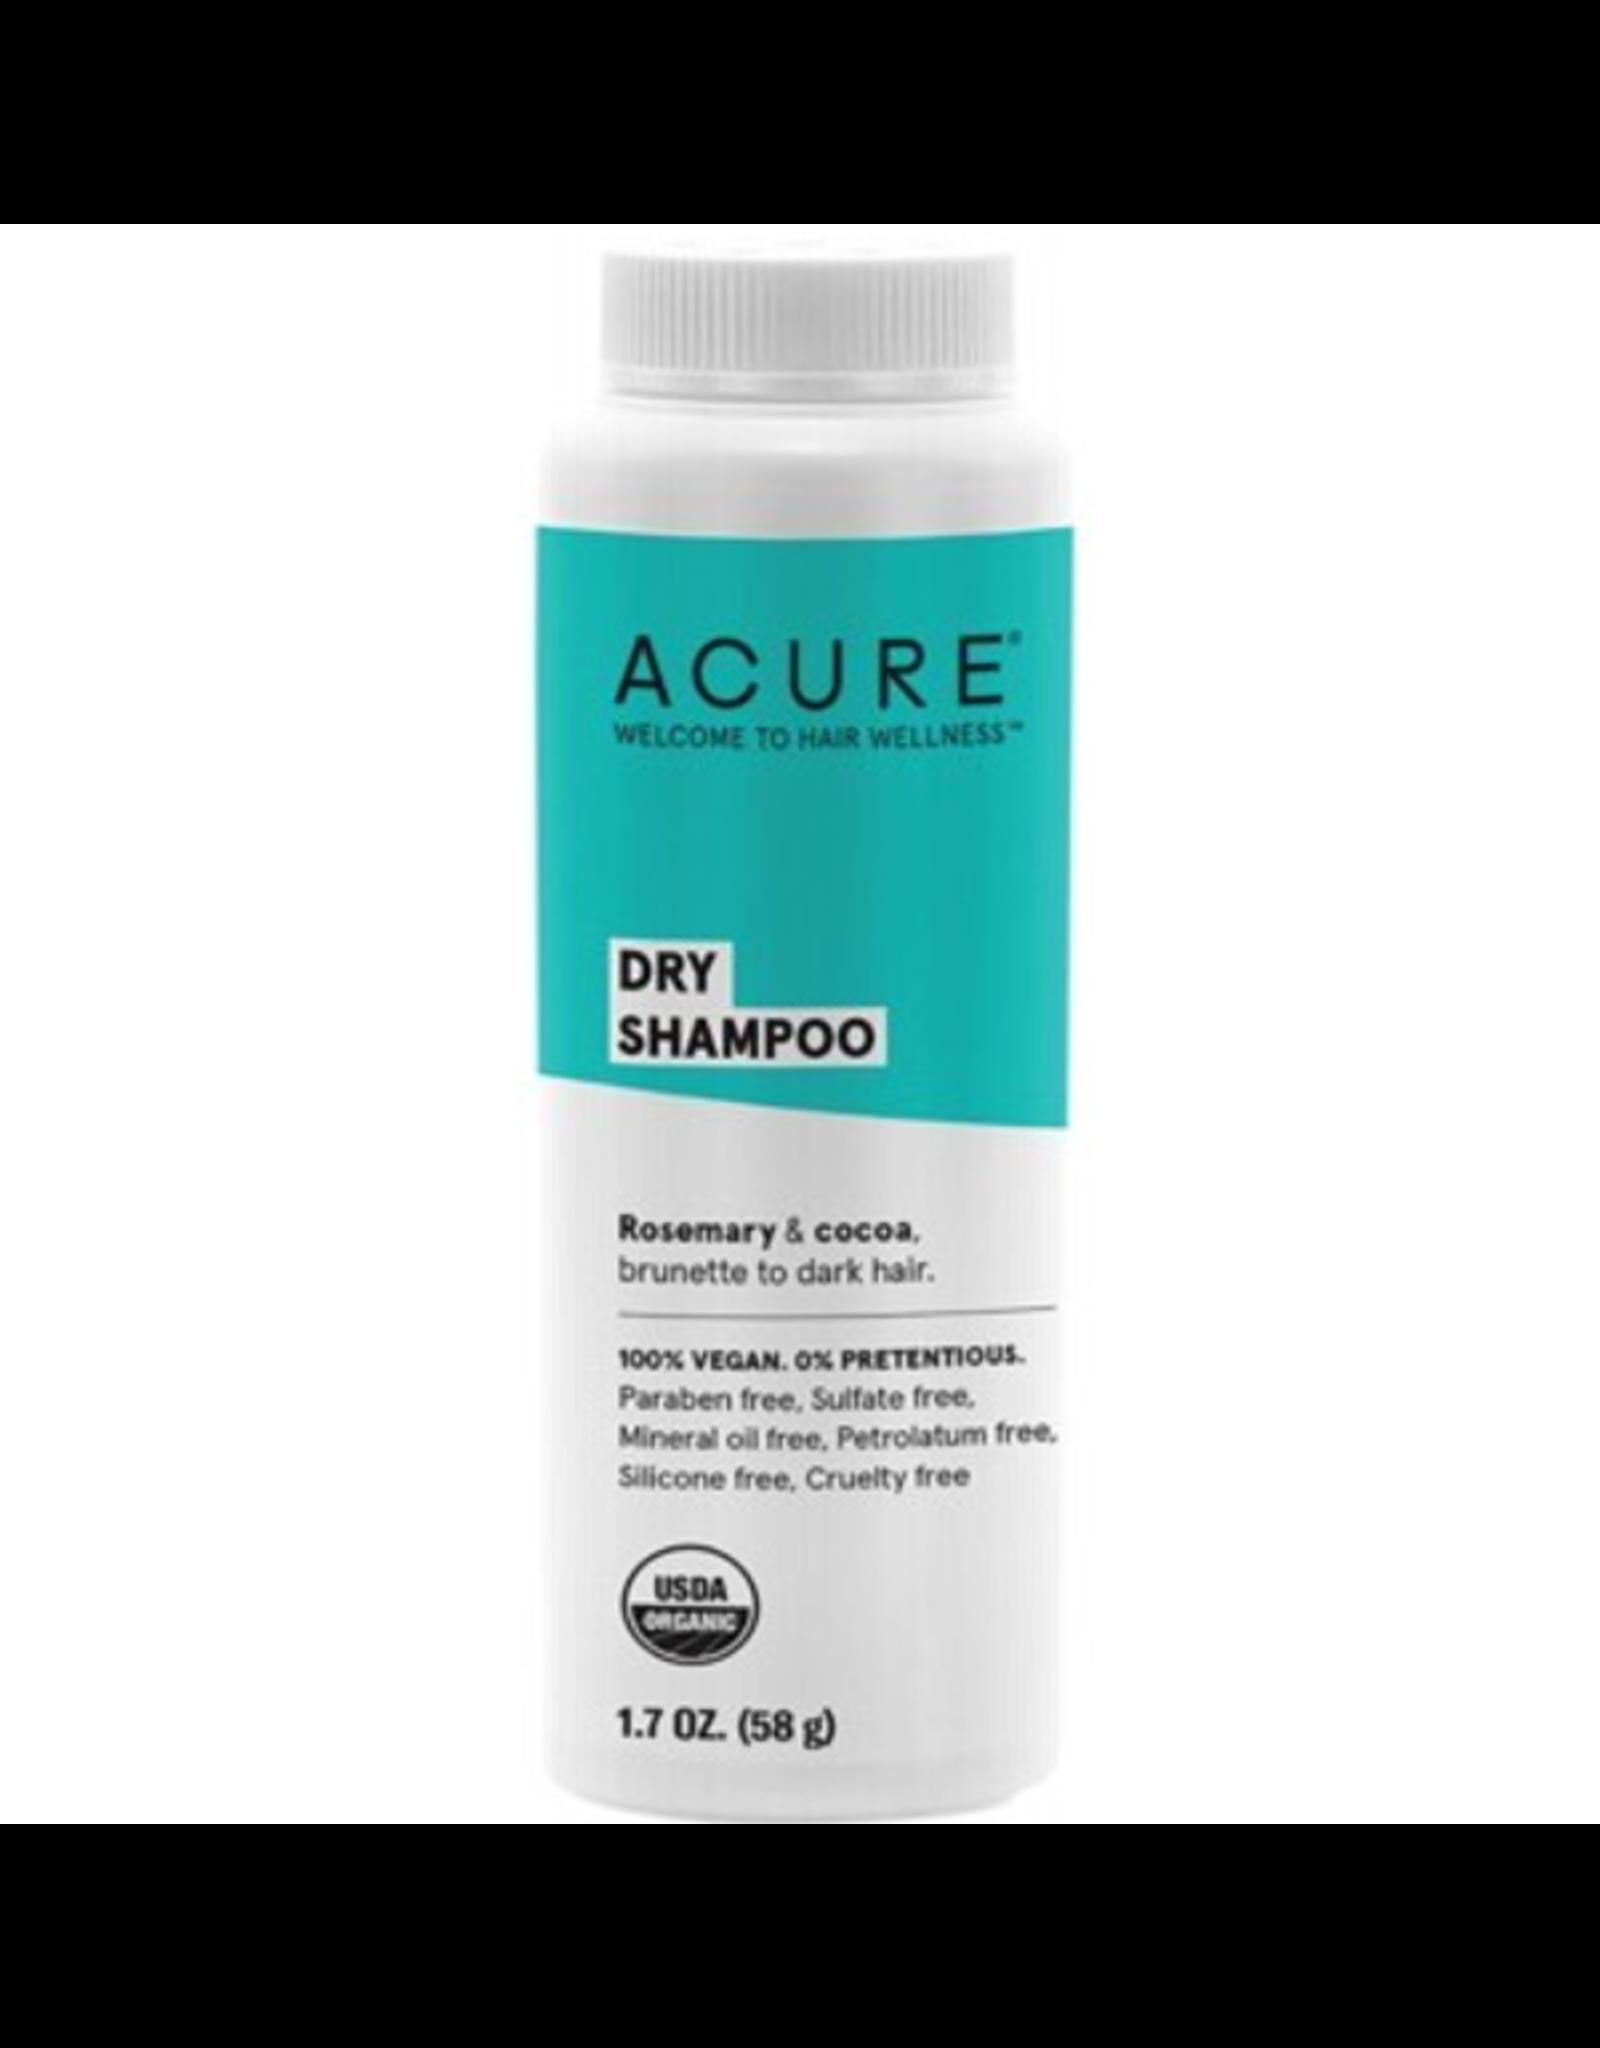 Acure Dry Shampoo- For Brunette to Dark Hair 48G